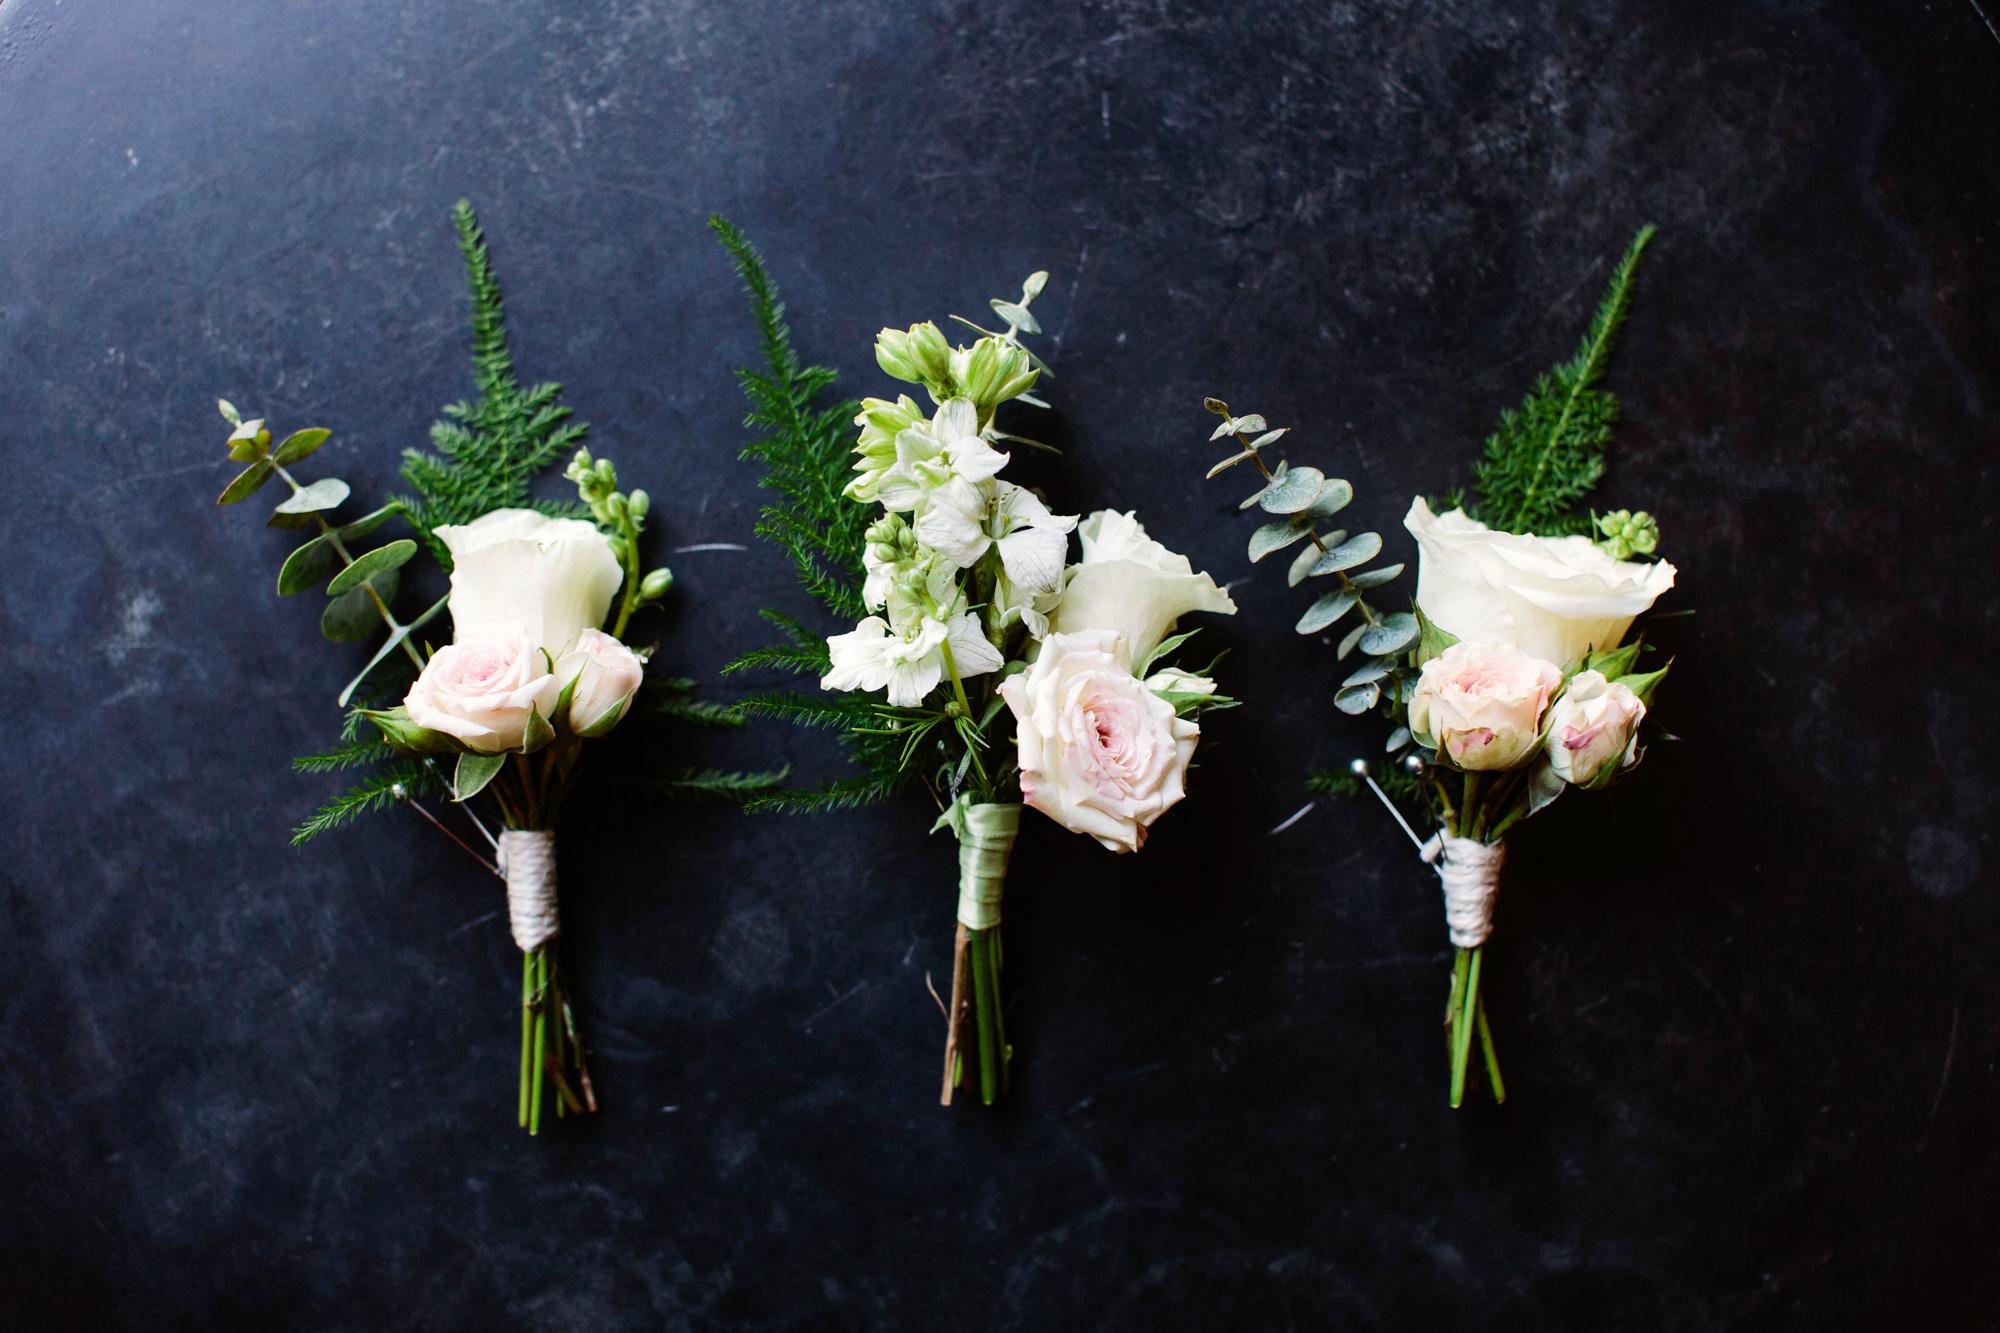 21_Rowan_Brian_The_Roundhouse_Wedding_Beacon_NY_Tanya_Salazar_Photography_1035.jpg